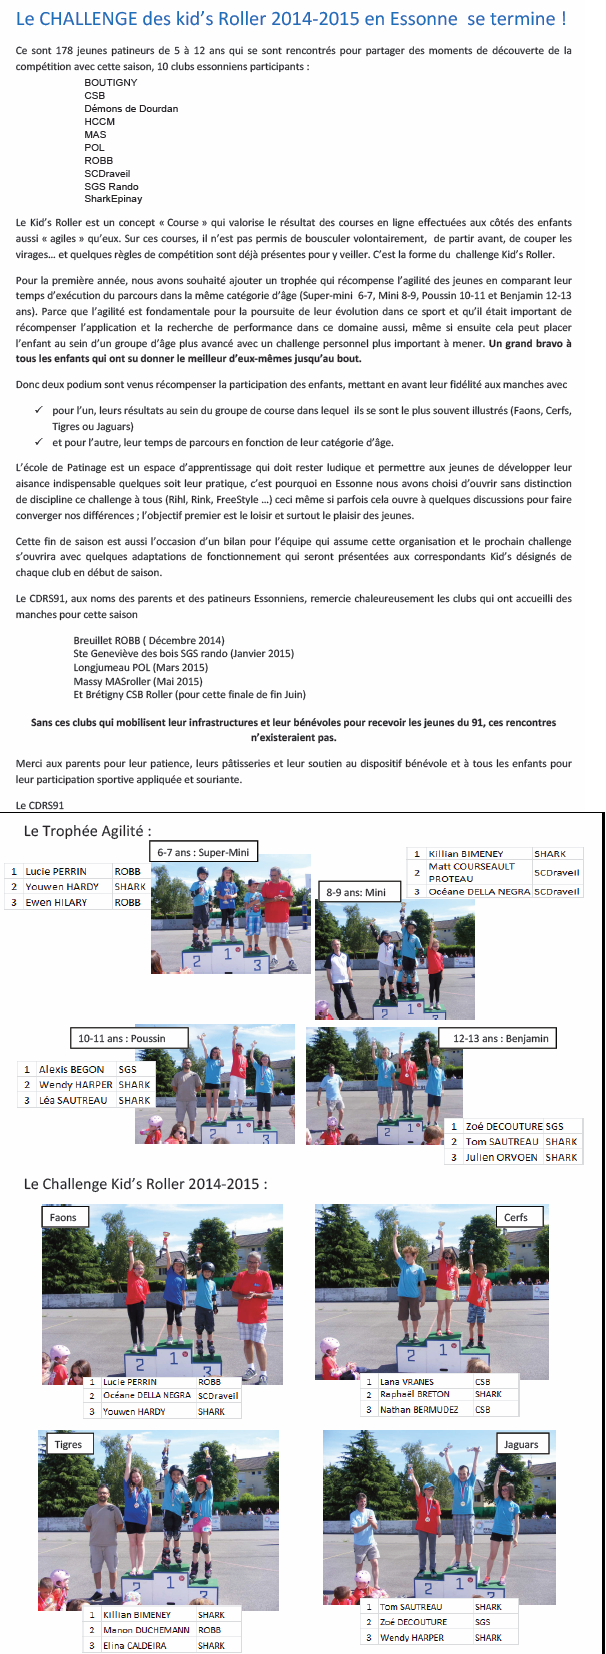 CRKdrChallenge2014-2015